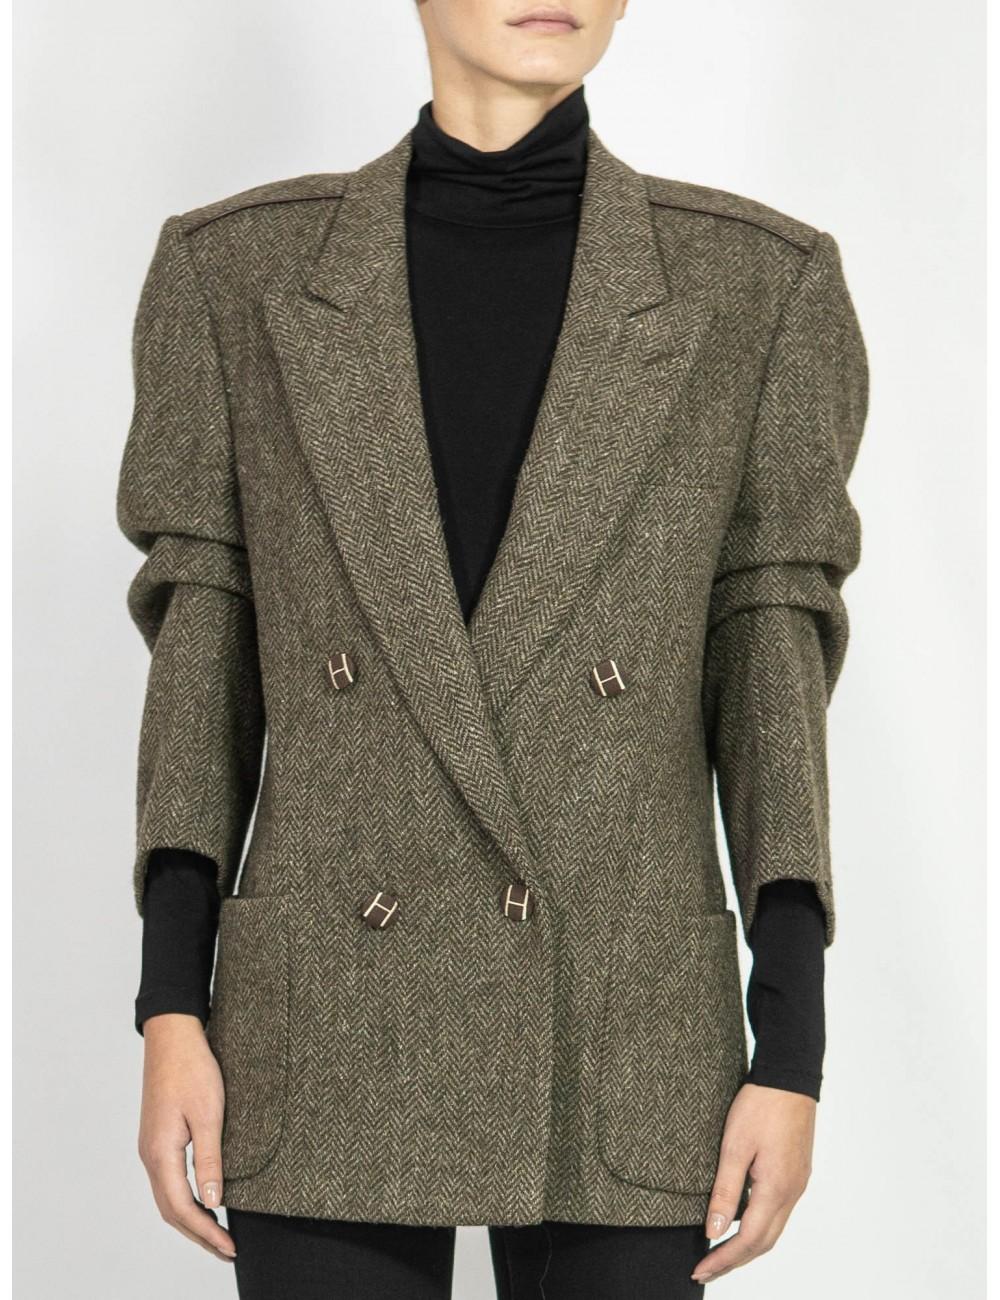 Upcycled organic fabrics jacket Hooldra